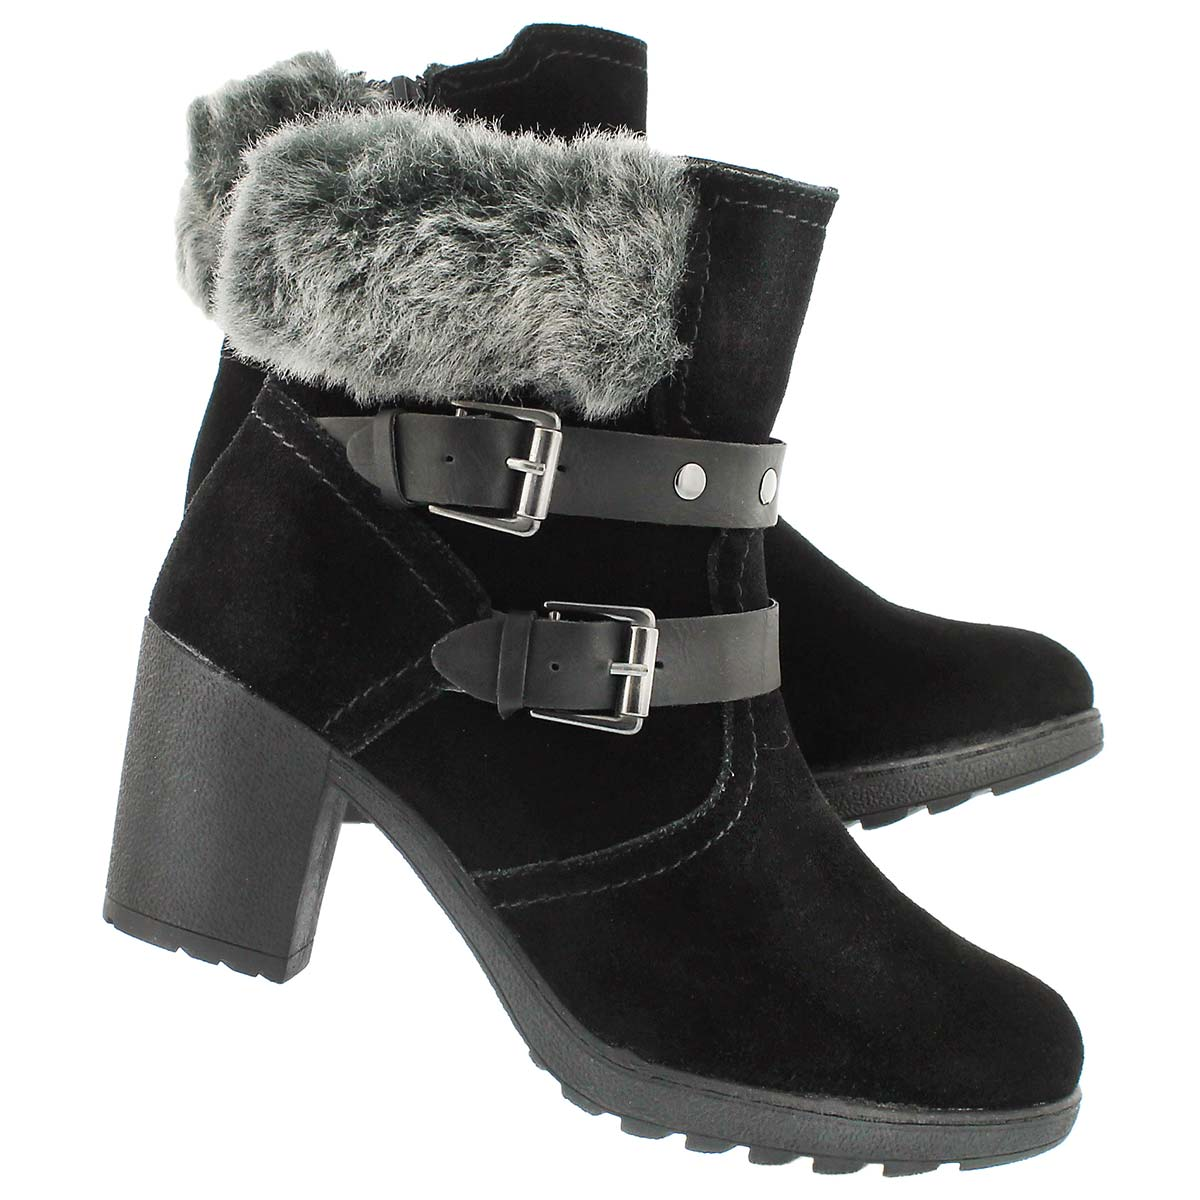 Bottes hiver hab. Riano, noir/gris, fem